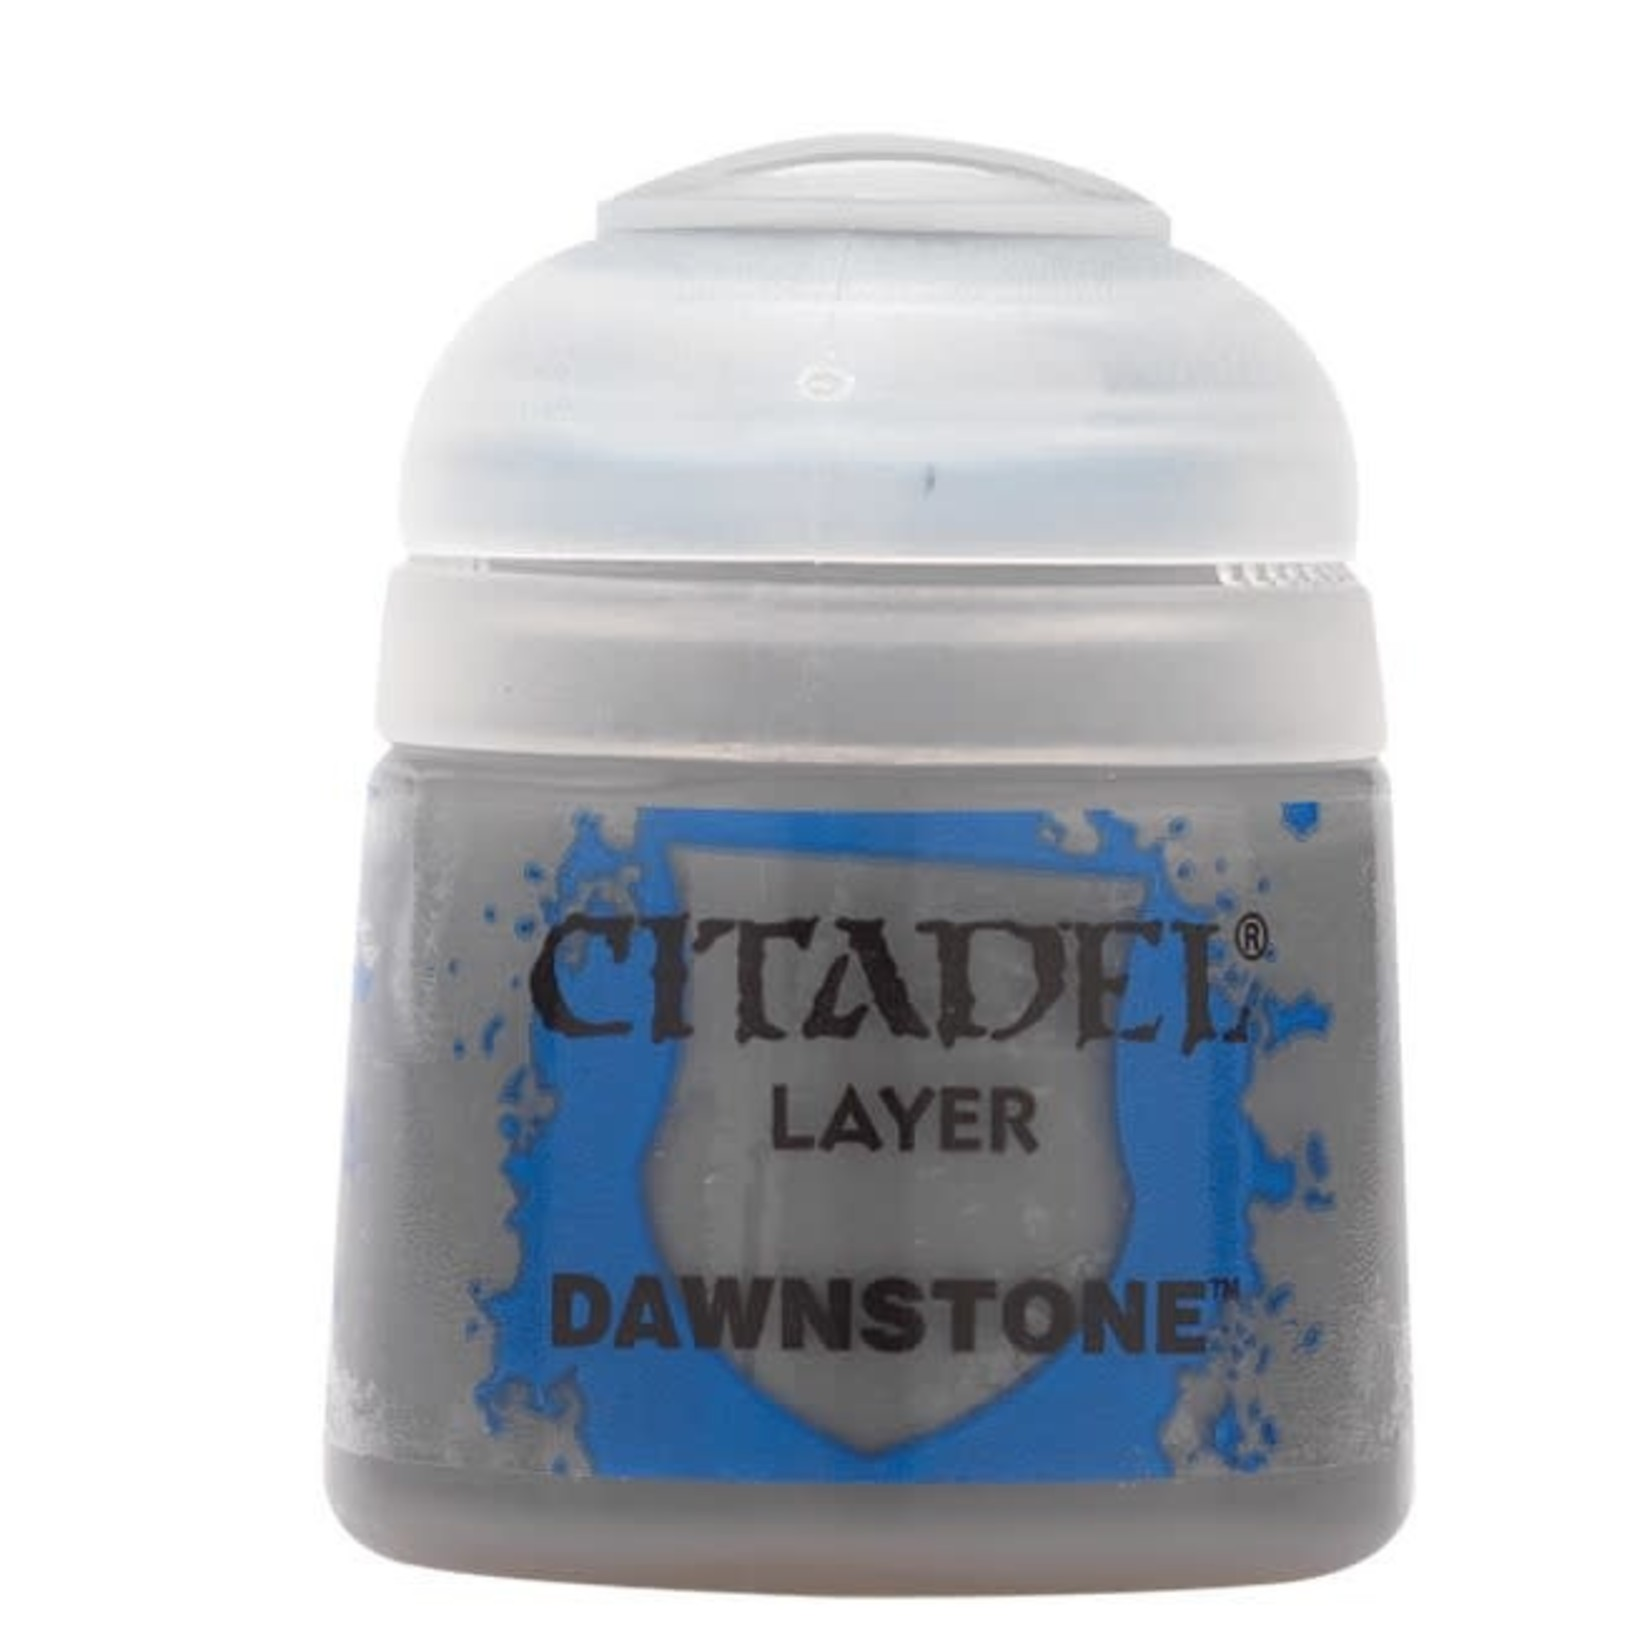 Games Workshop Citadel Paint: Dawnstone 12ml